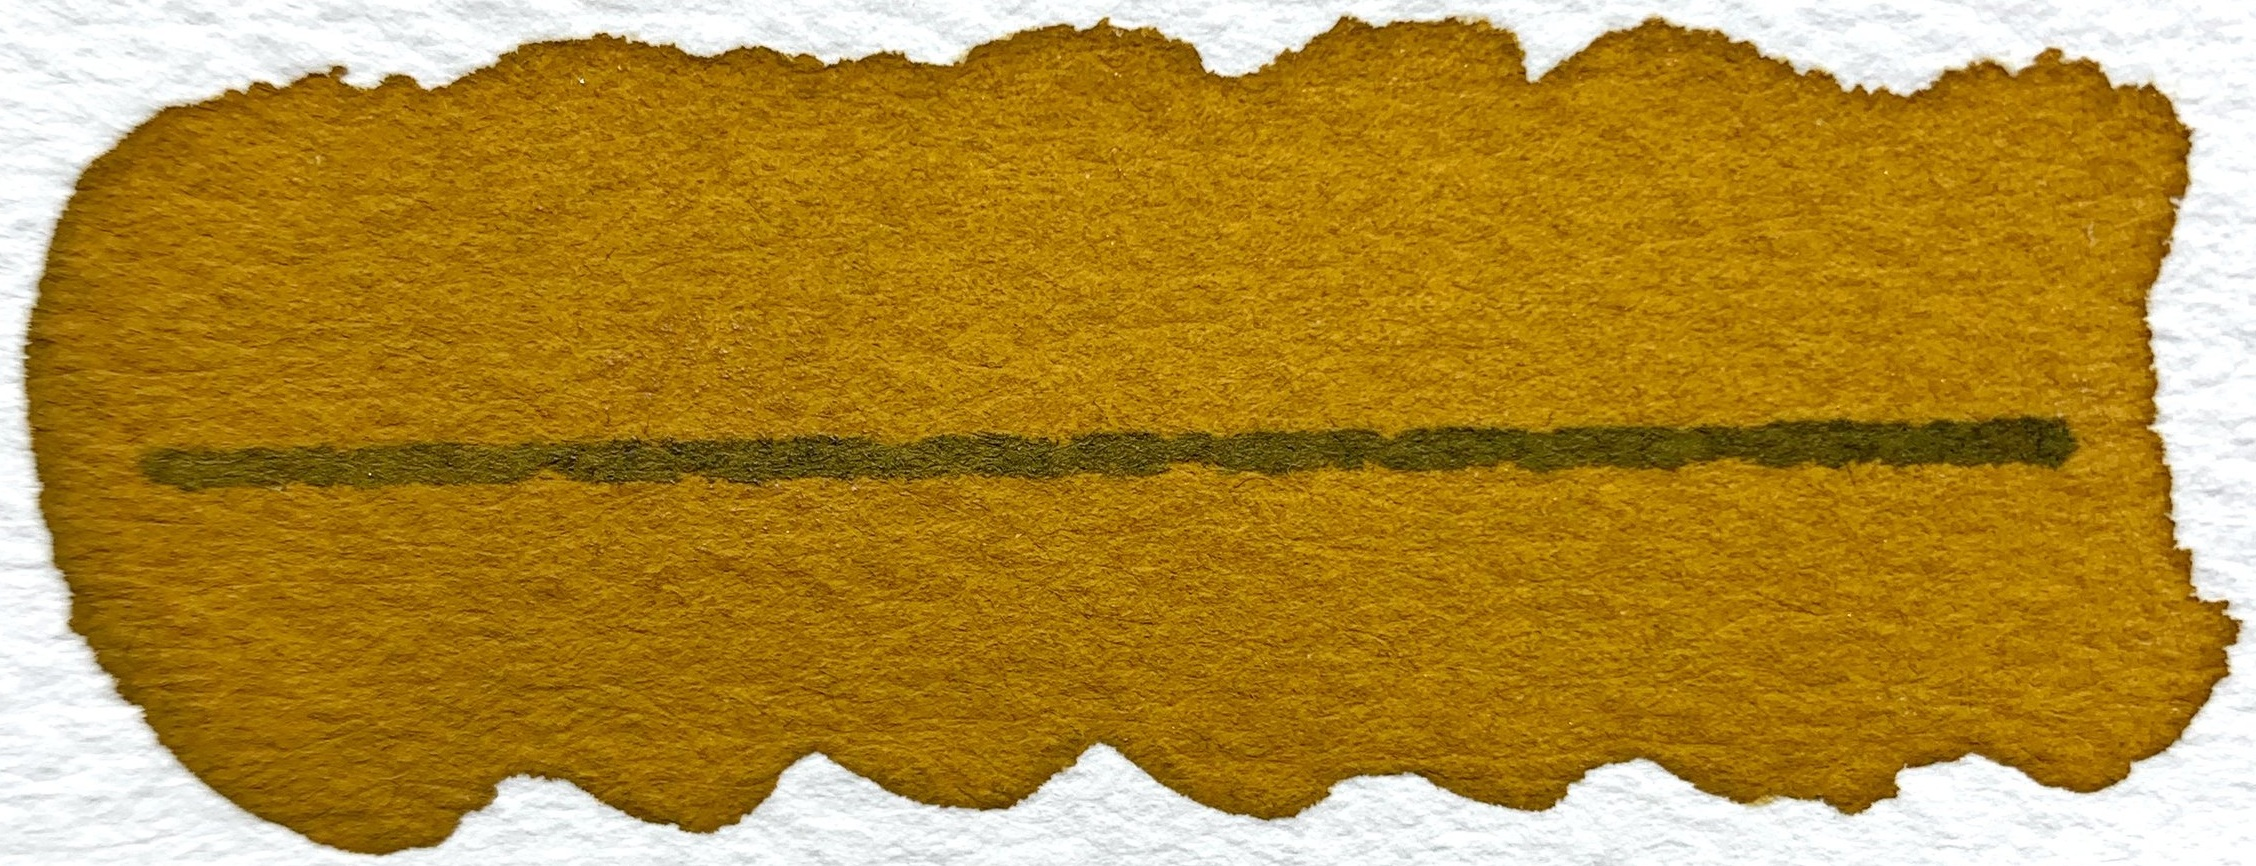 Cornbread - PY43, opaque, excellent lightfastness, staining